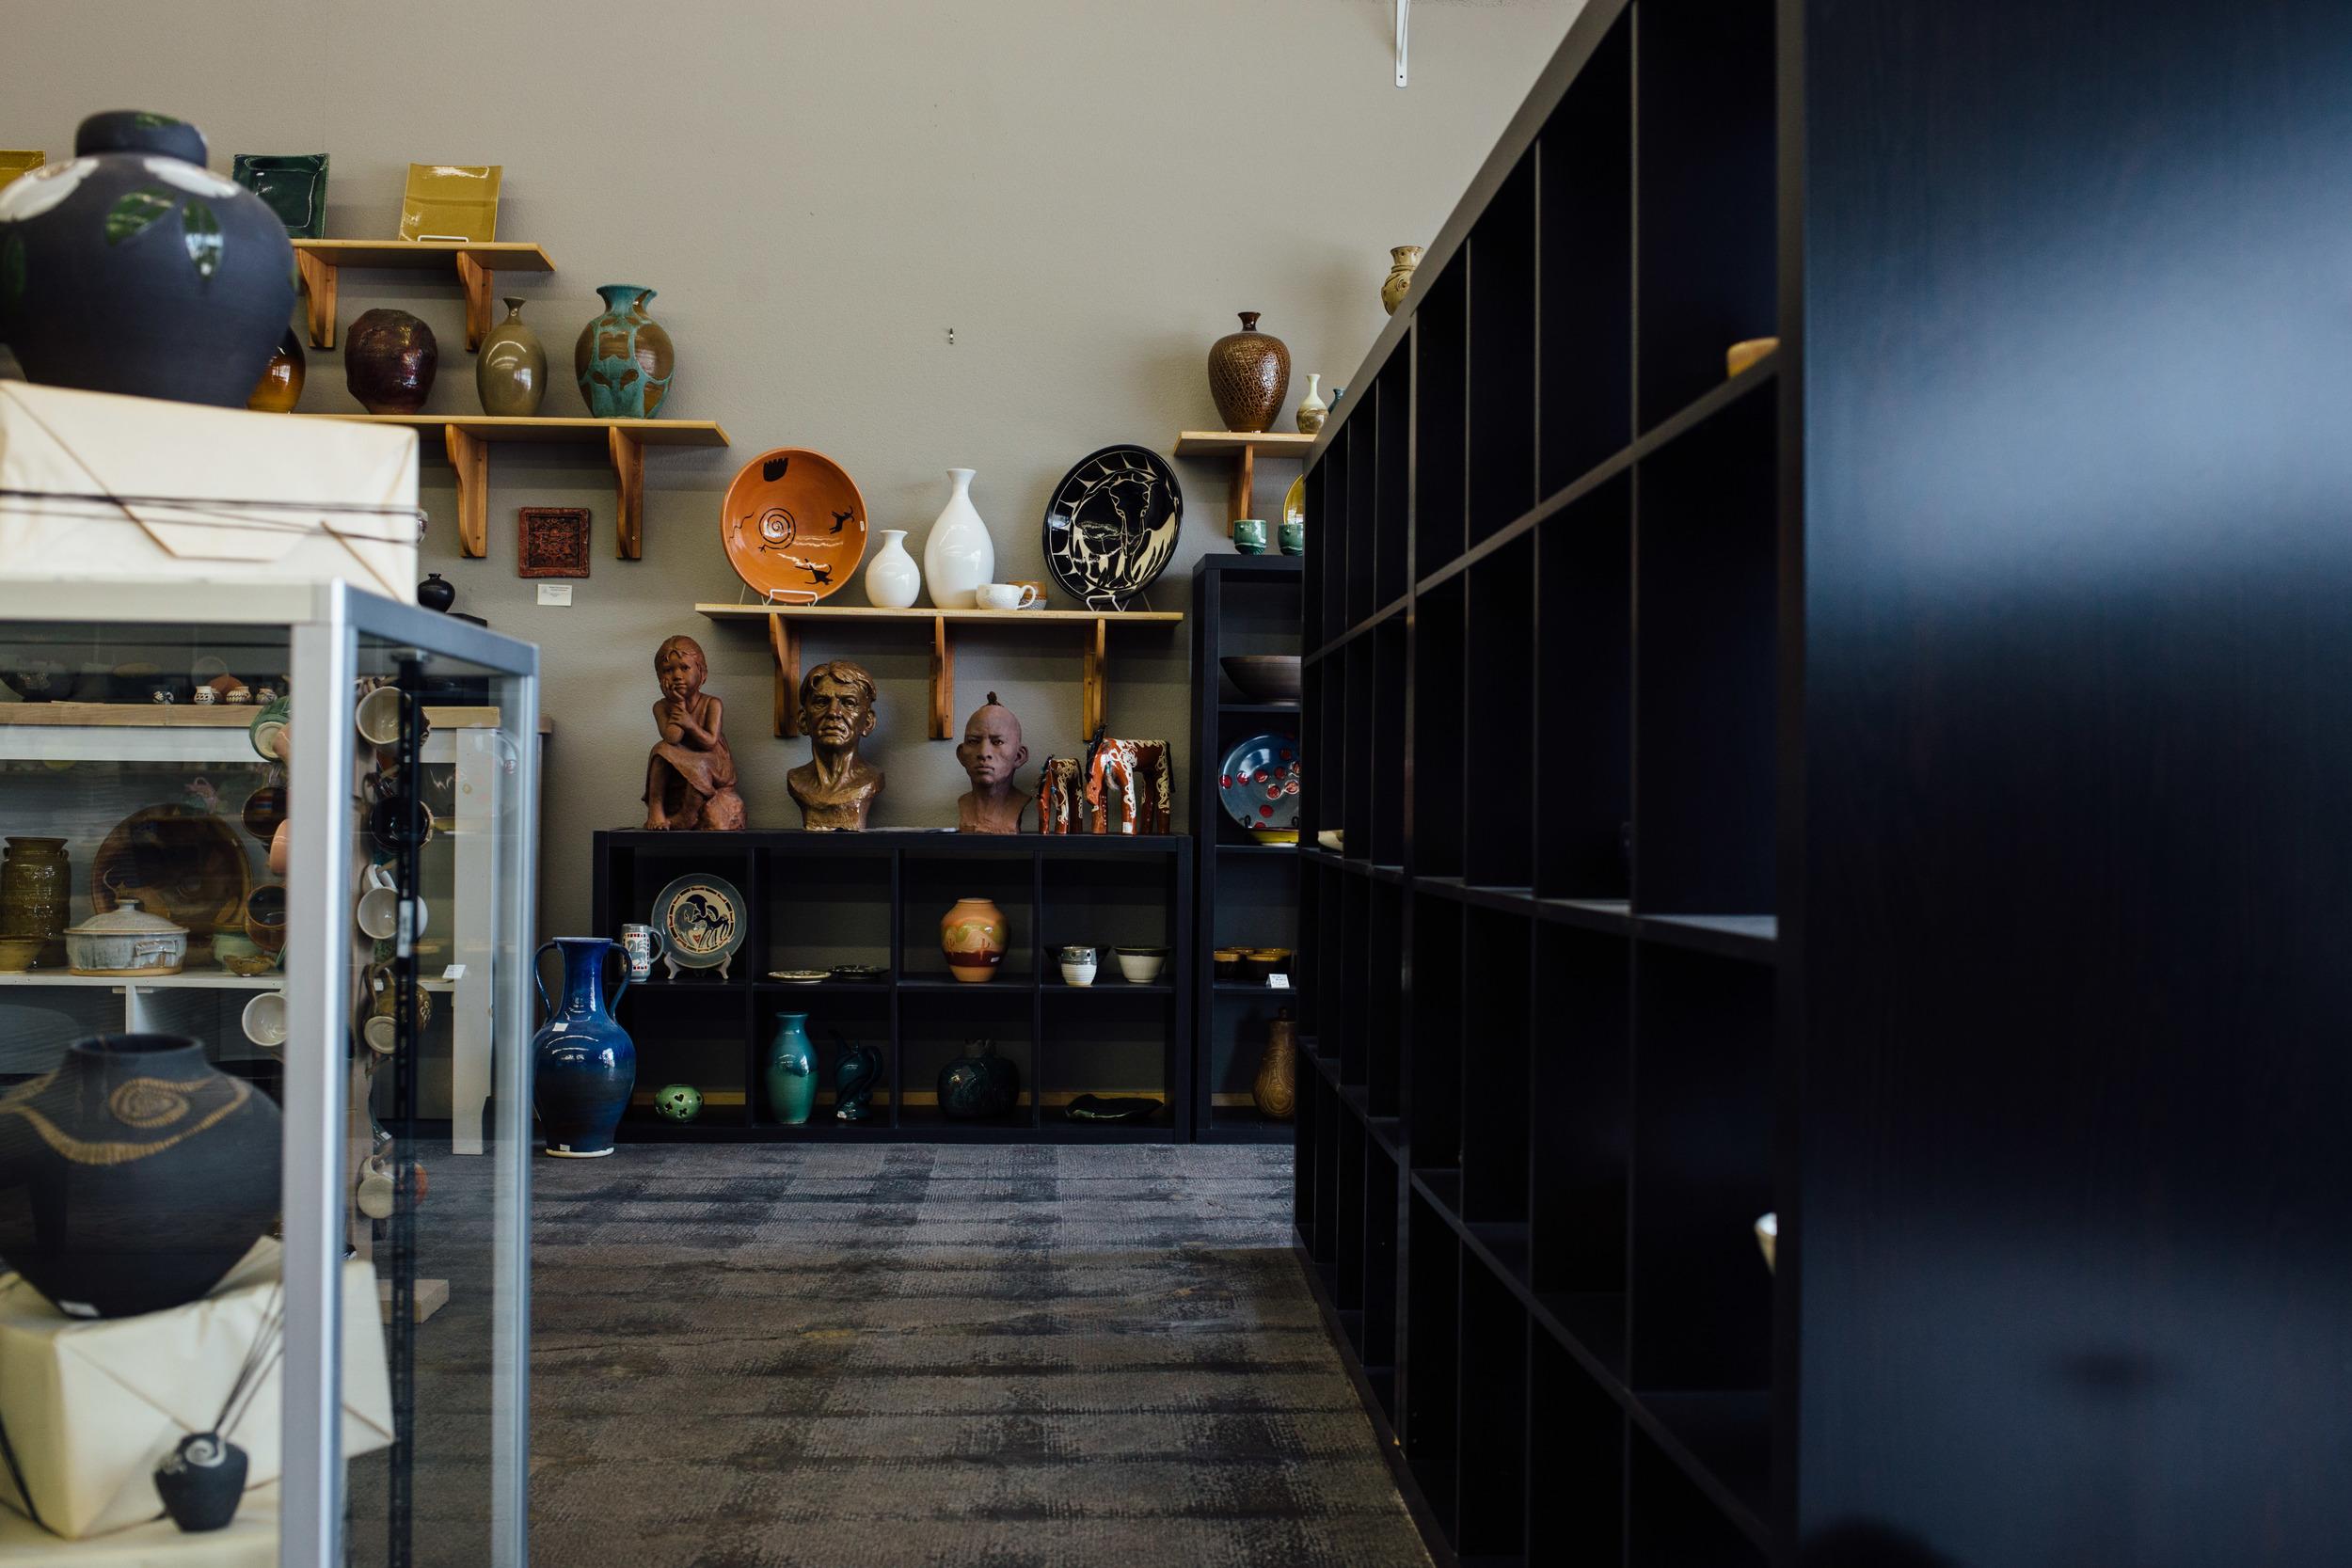 Shop interior pottery studio artist local business St George UT